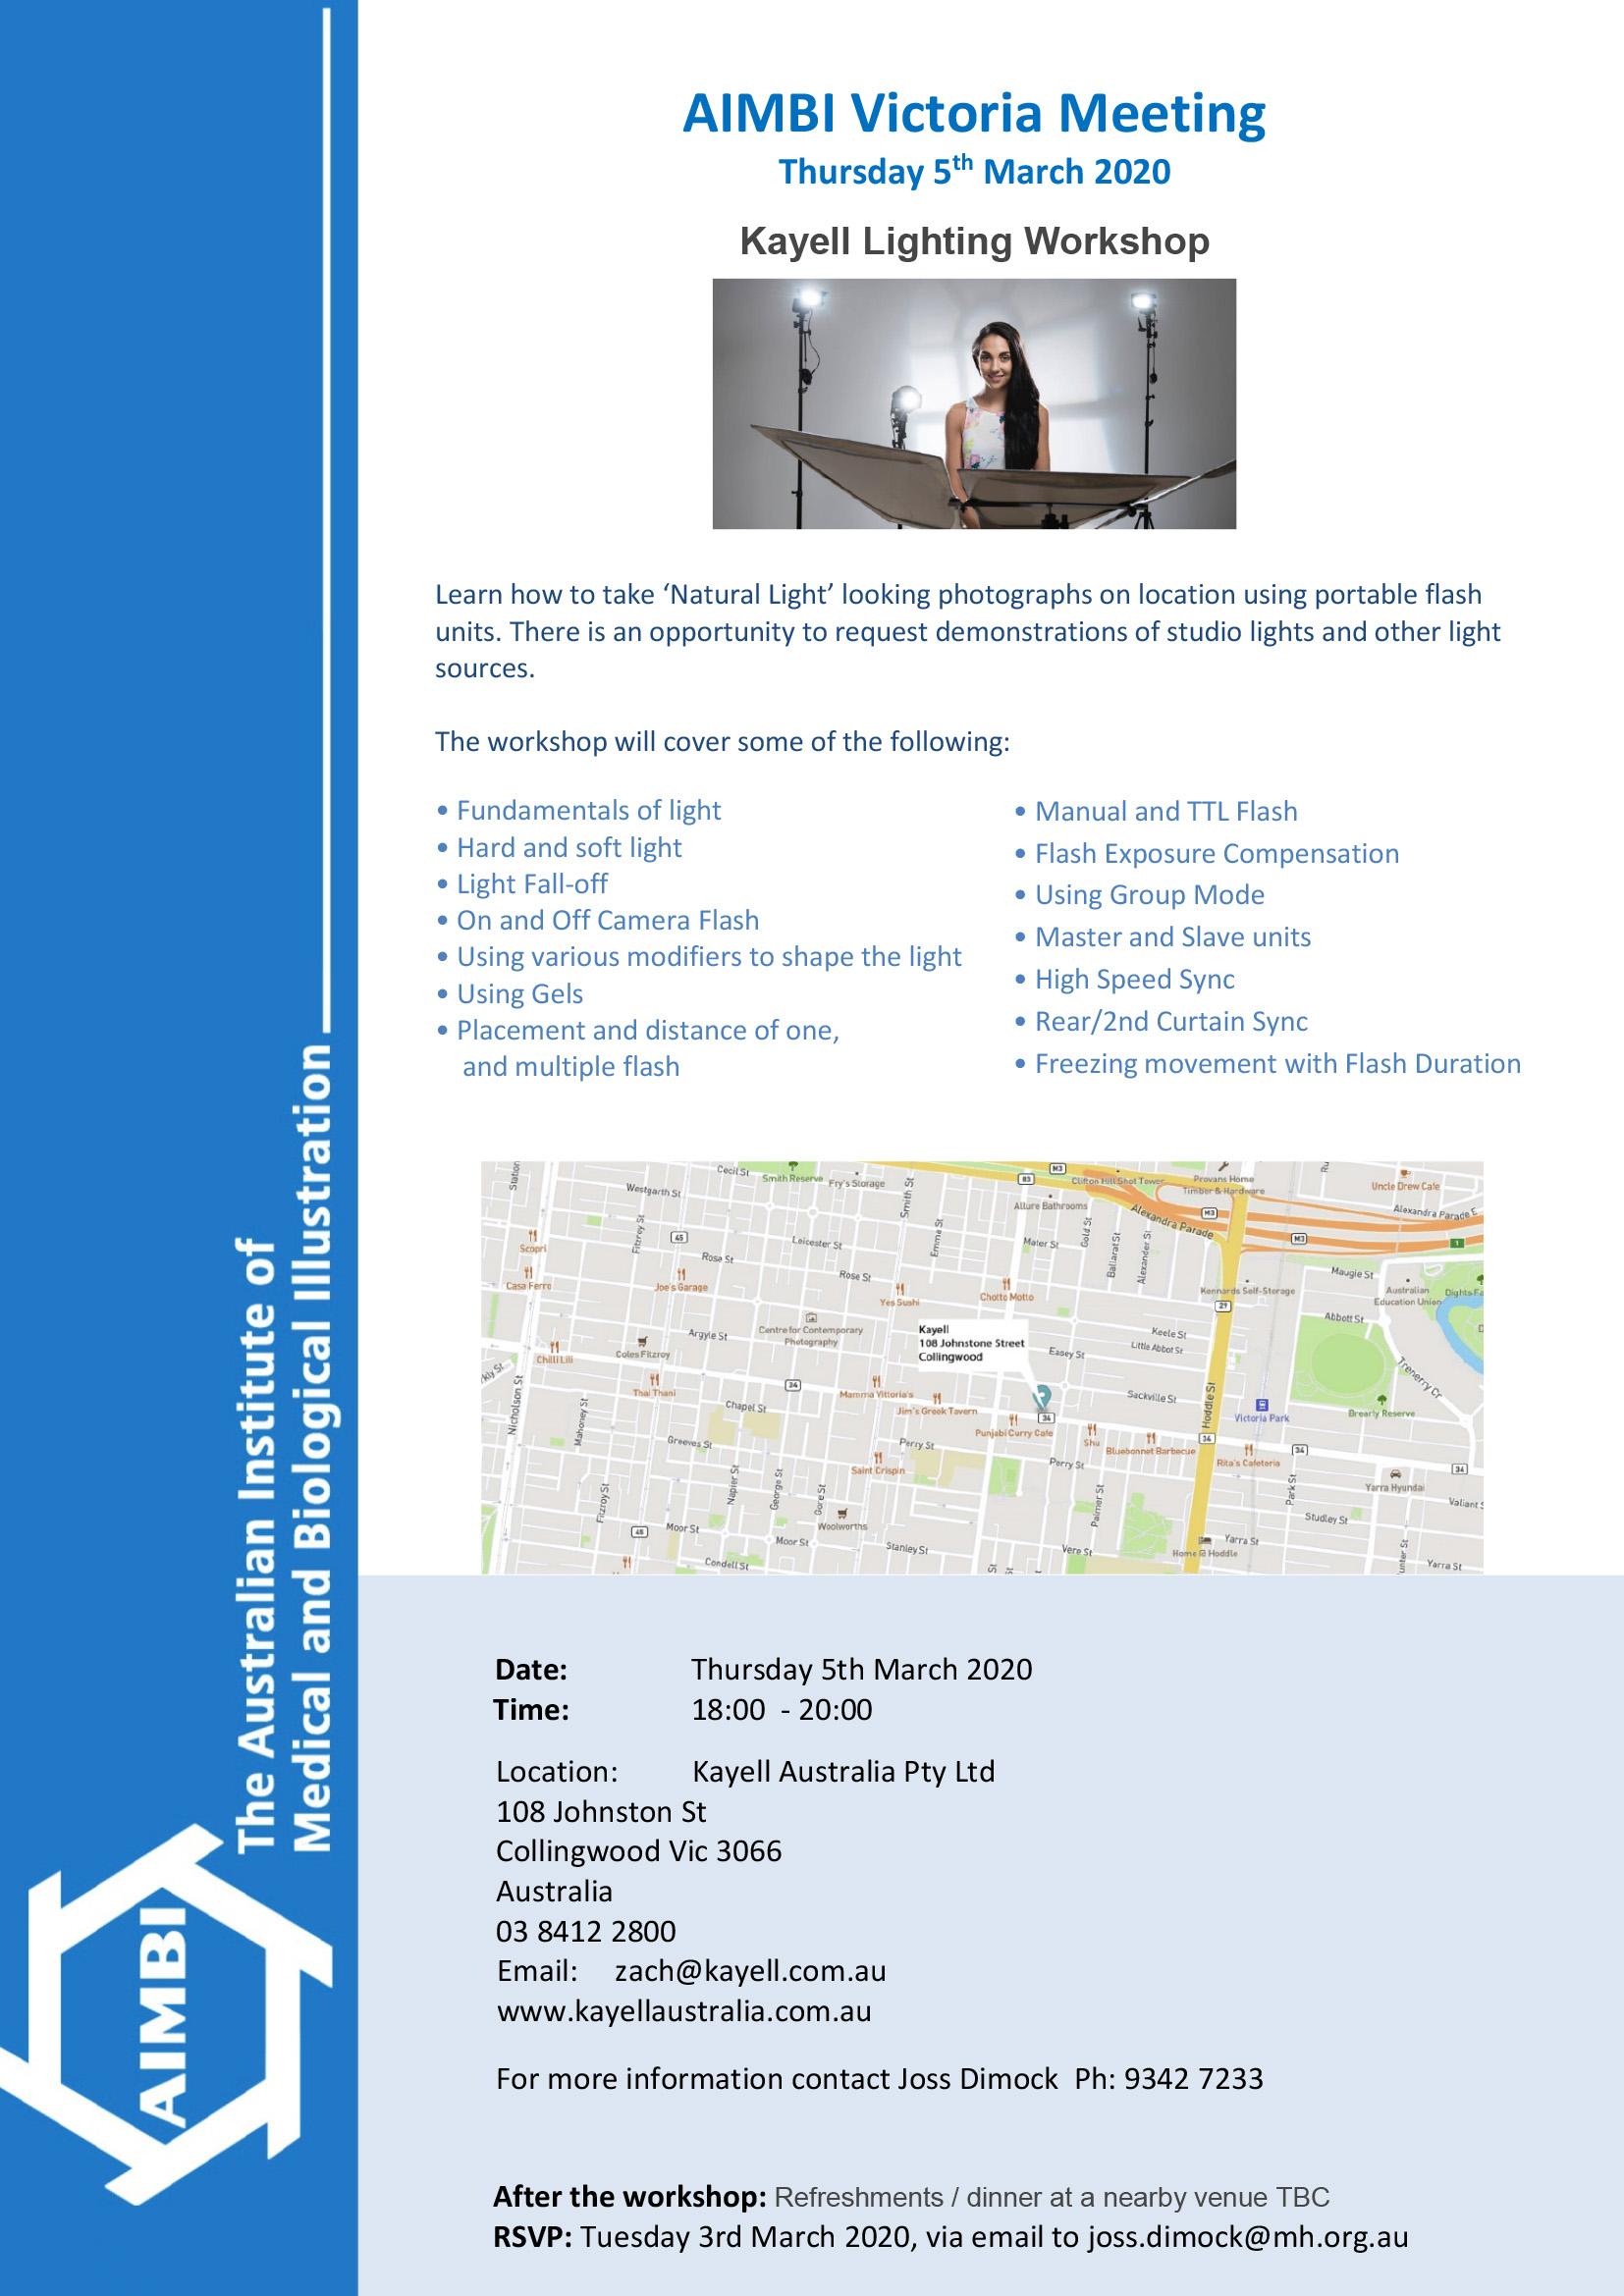 2020-AIMBI-VIC-Kayell-March5th_Meeting-invite-1